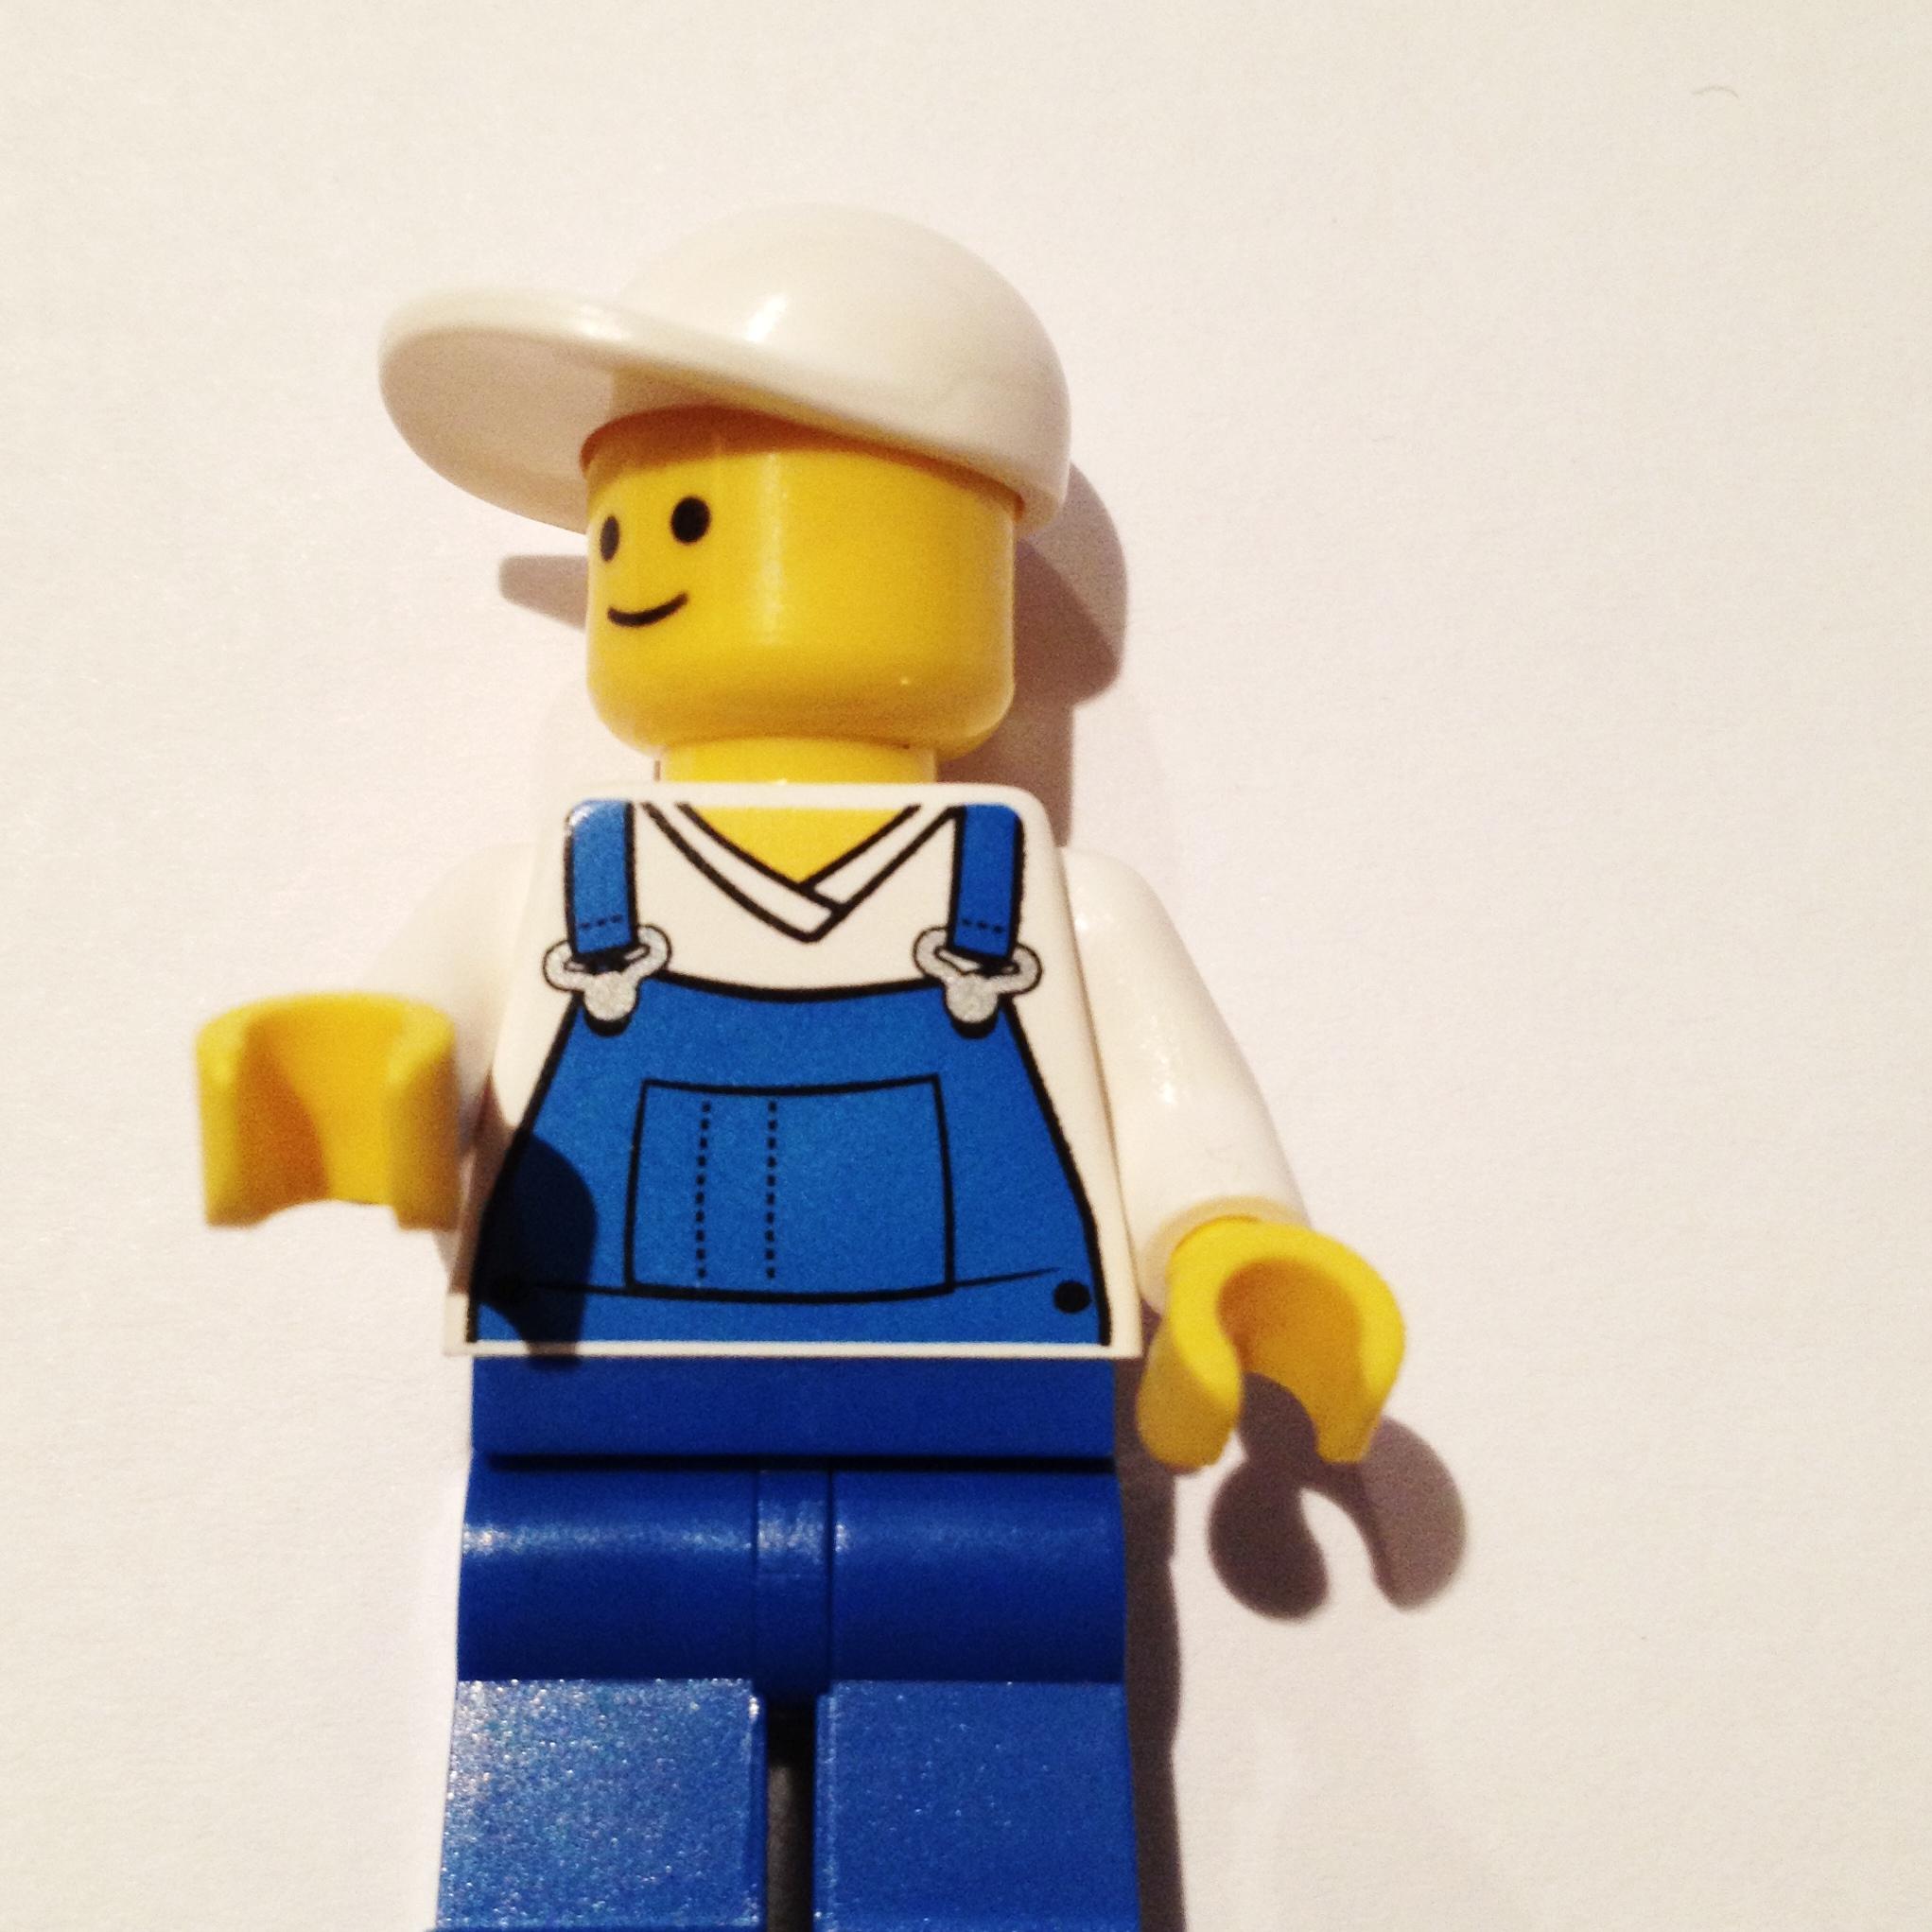 LegomanKijkt.jpg